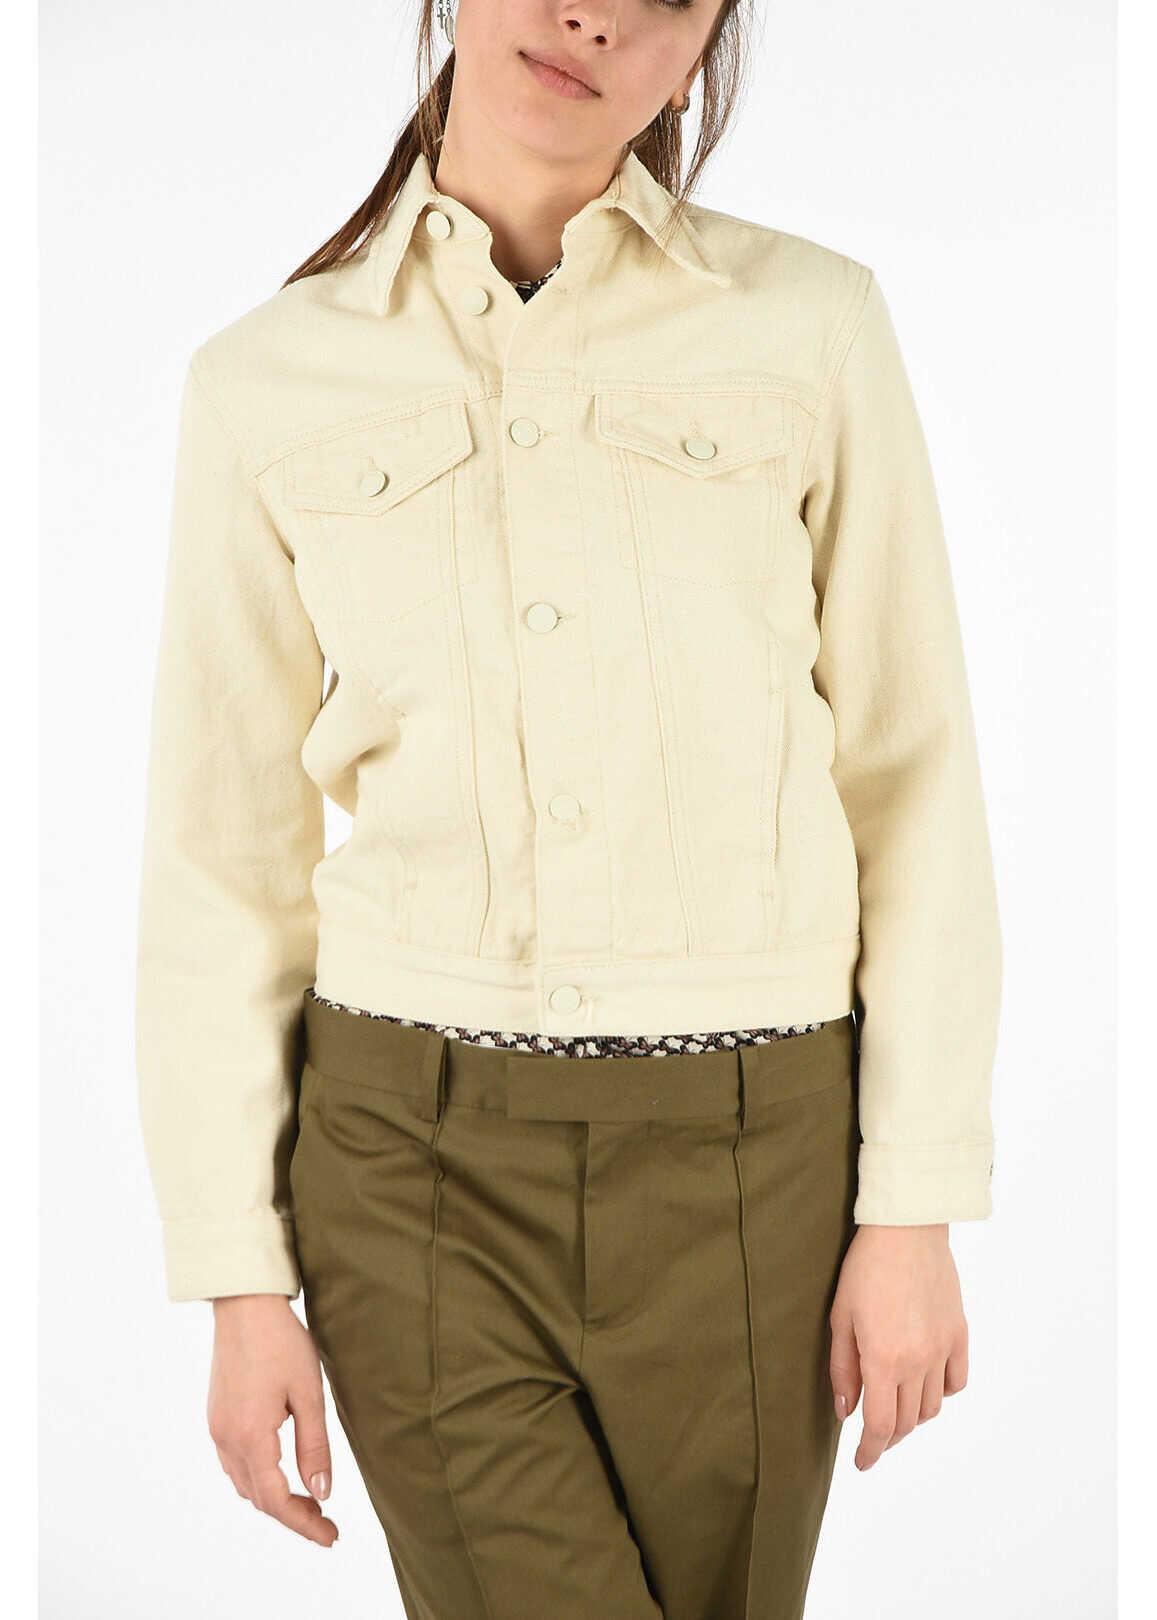 Calvin Klein waist length denim CLASSIC TRUCKER jacket BEIGE